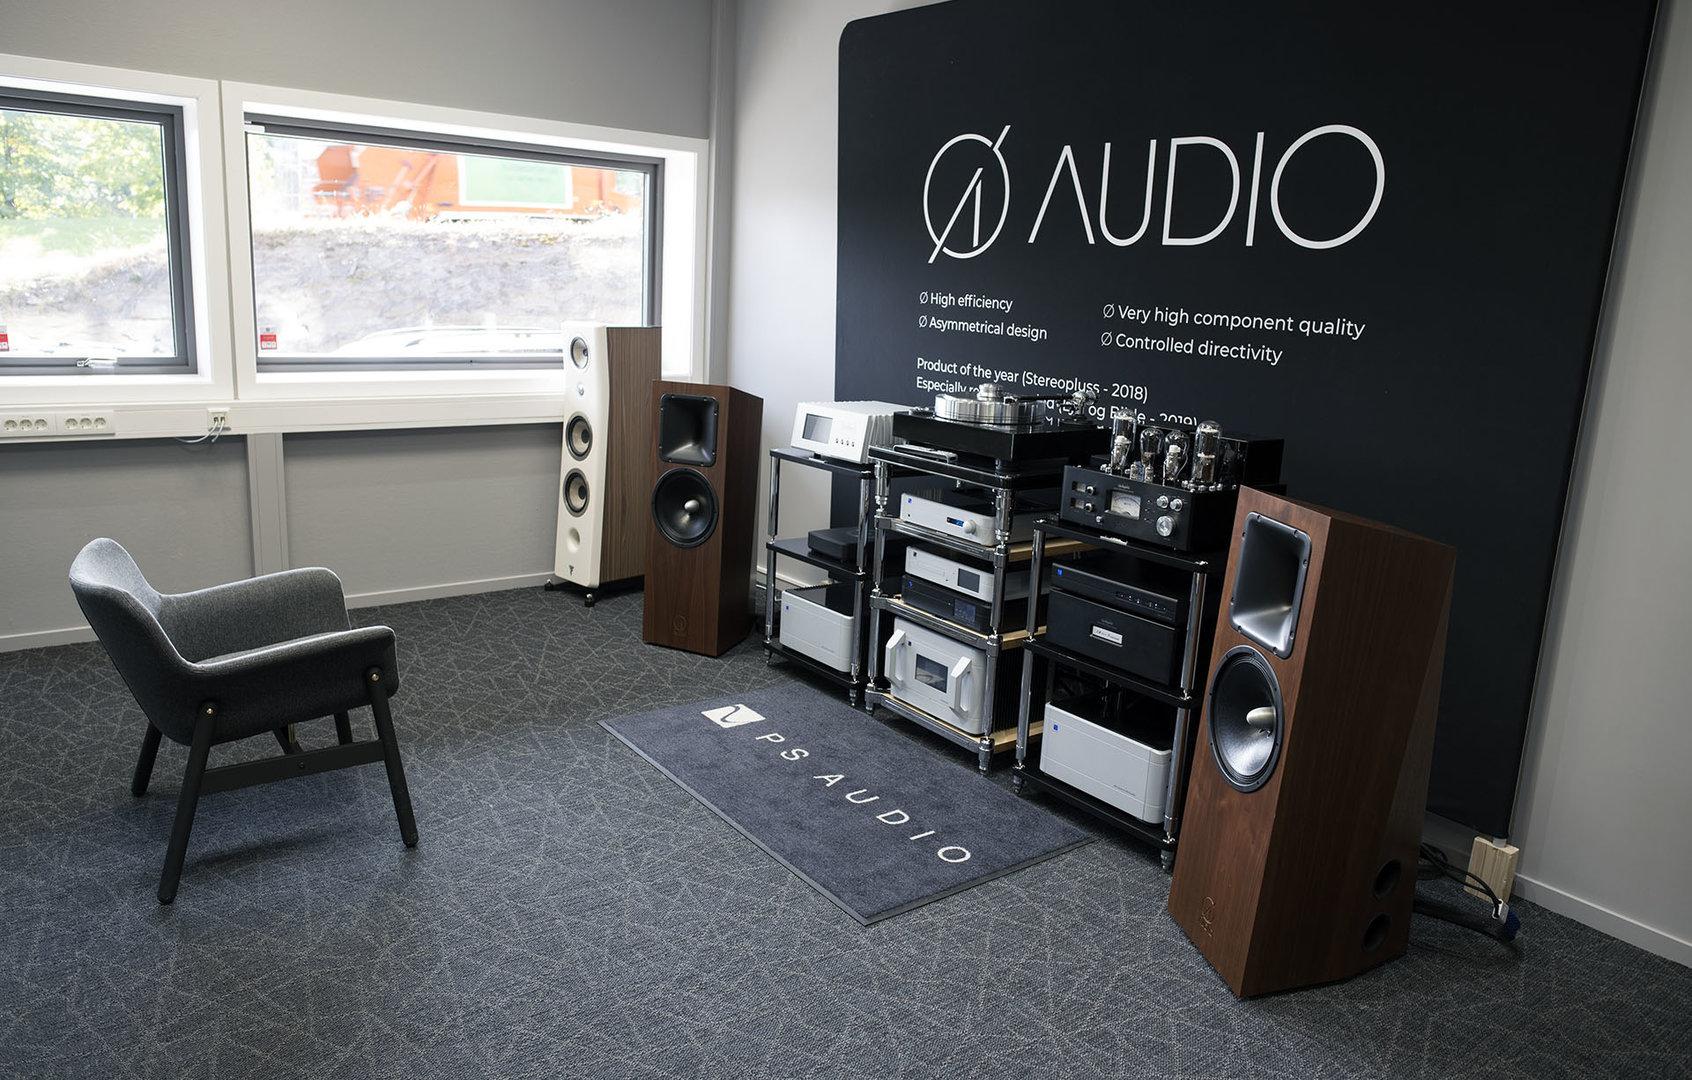 O-audio-0.jpg